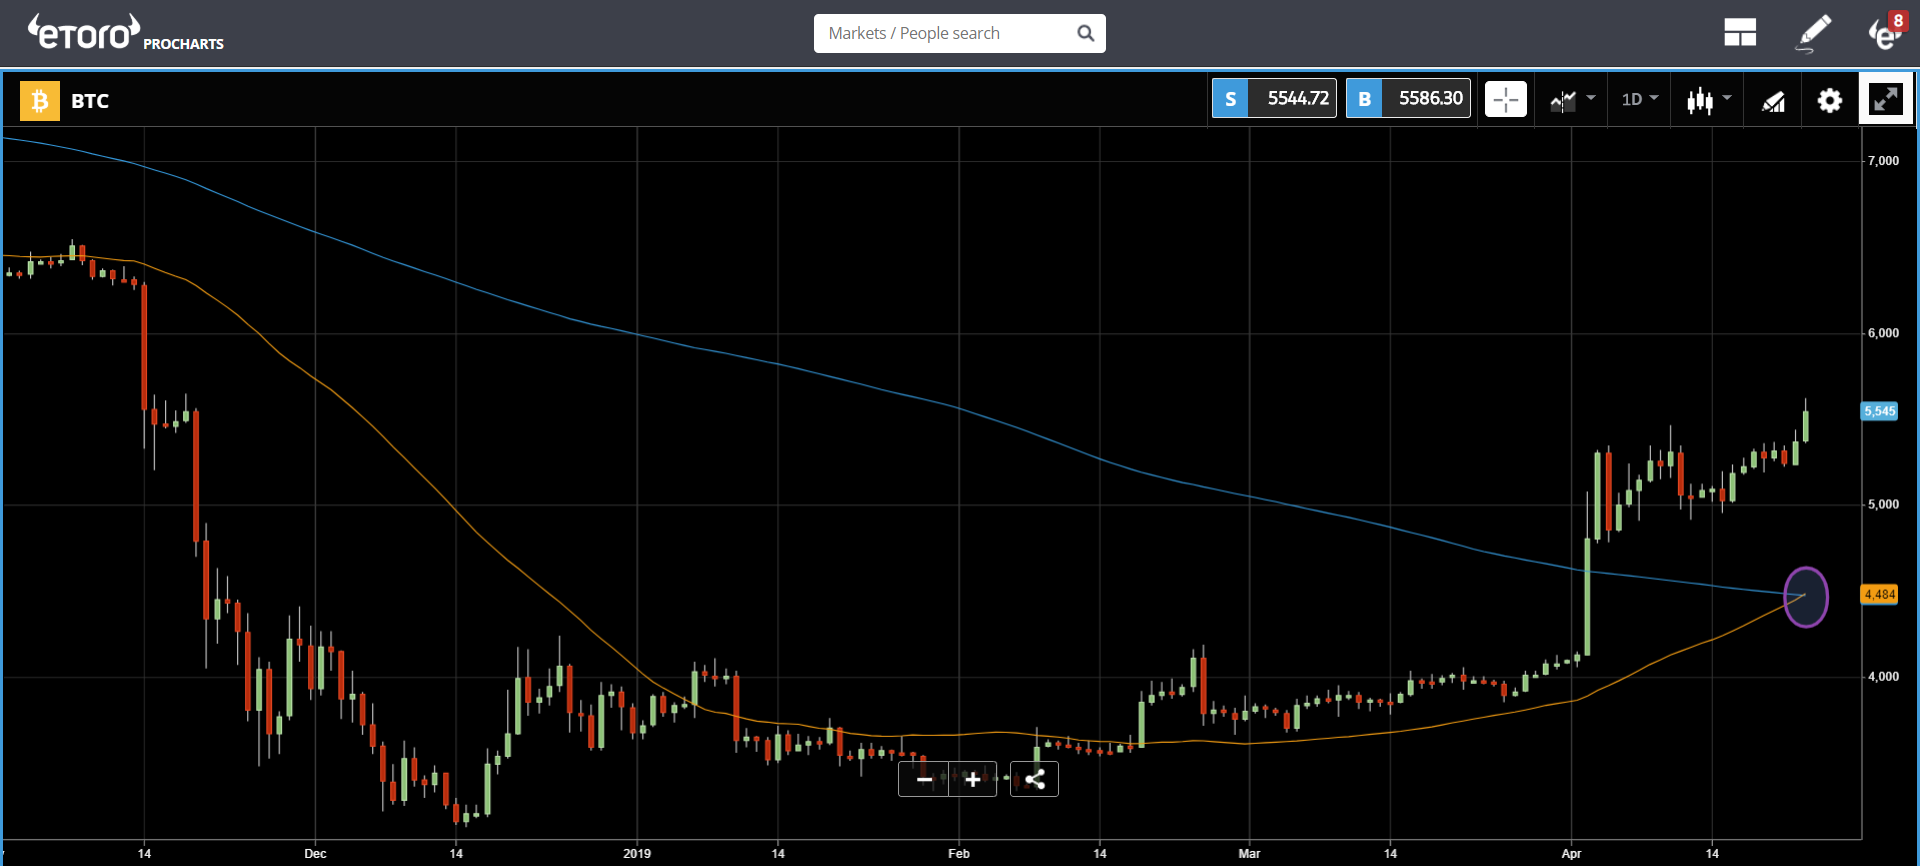 crypto, cryptocurrency, market, trading, bitcoin, blockchain, ethereum, stocks, iran